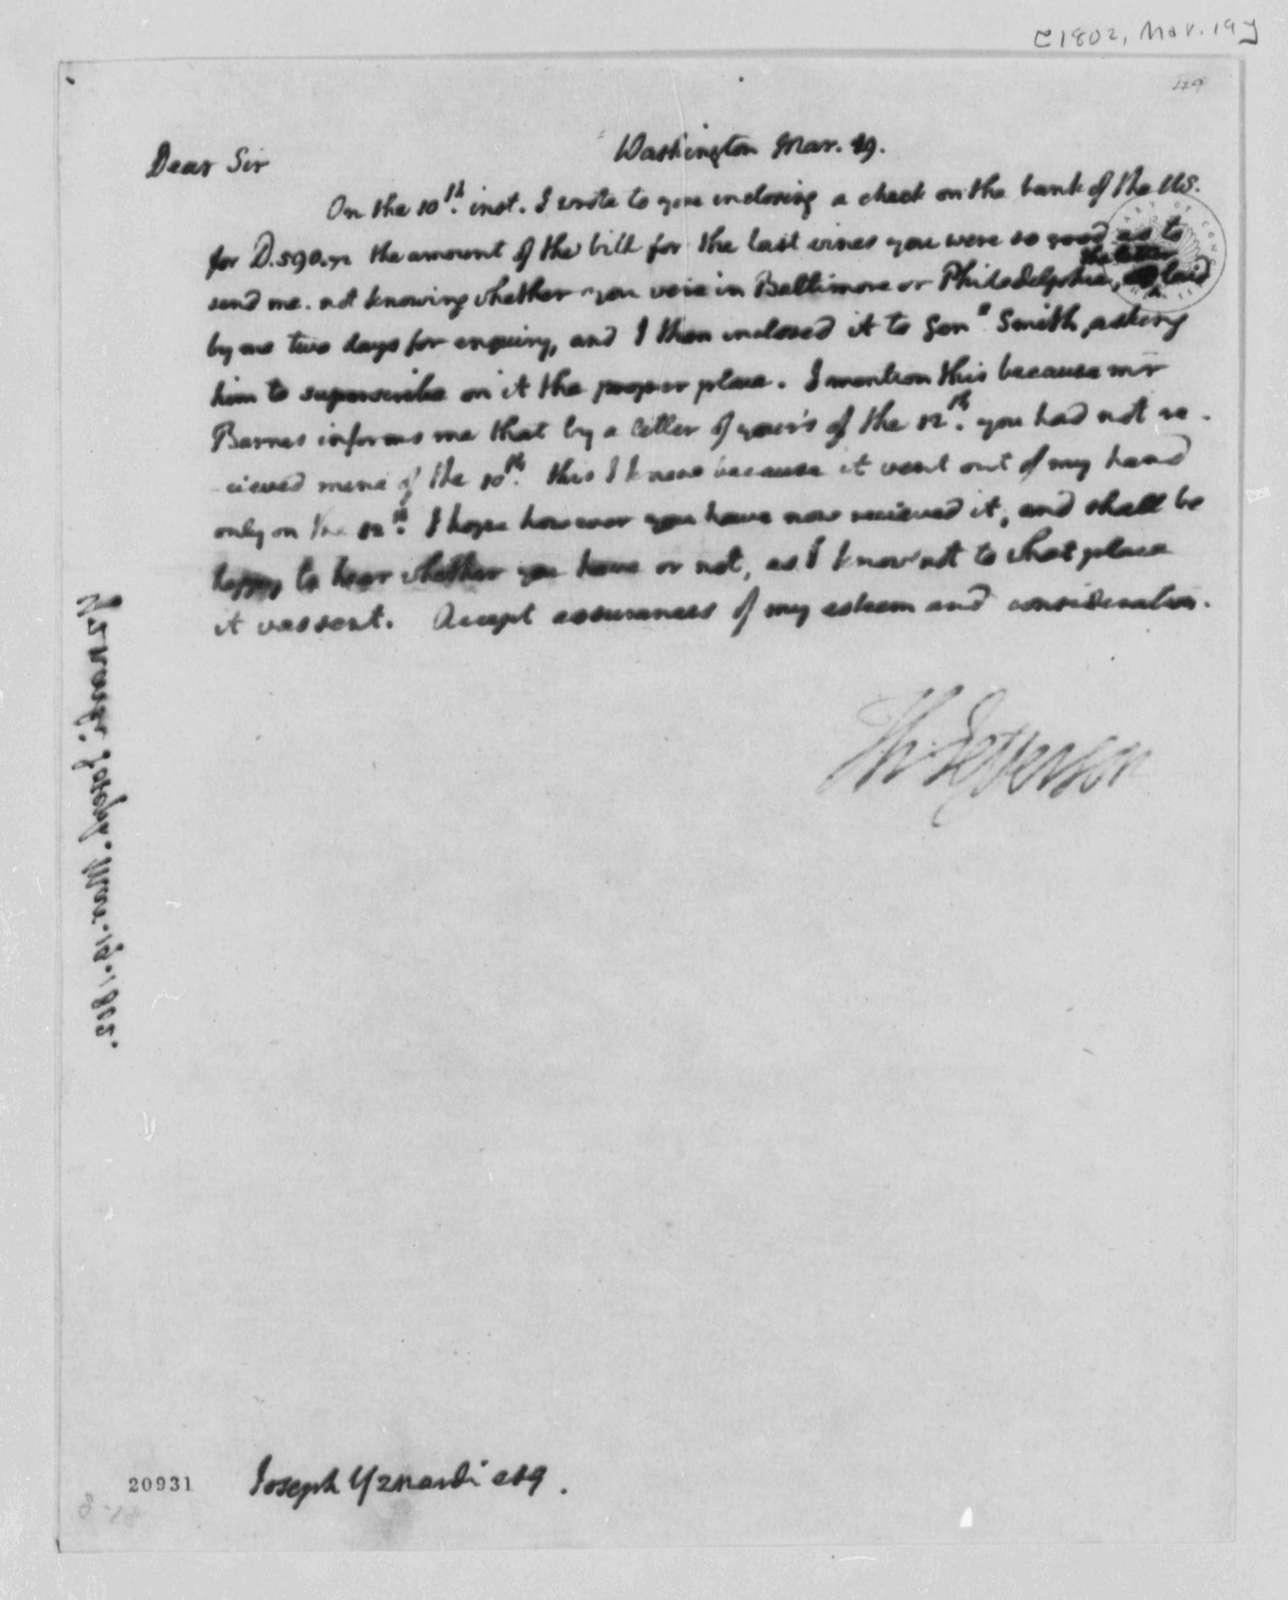 Thomas Jefferson to Josef Yznardi, March 19, 1802